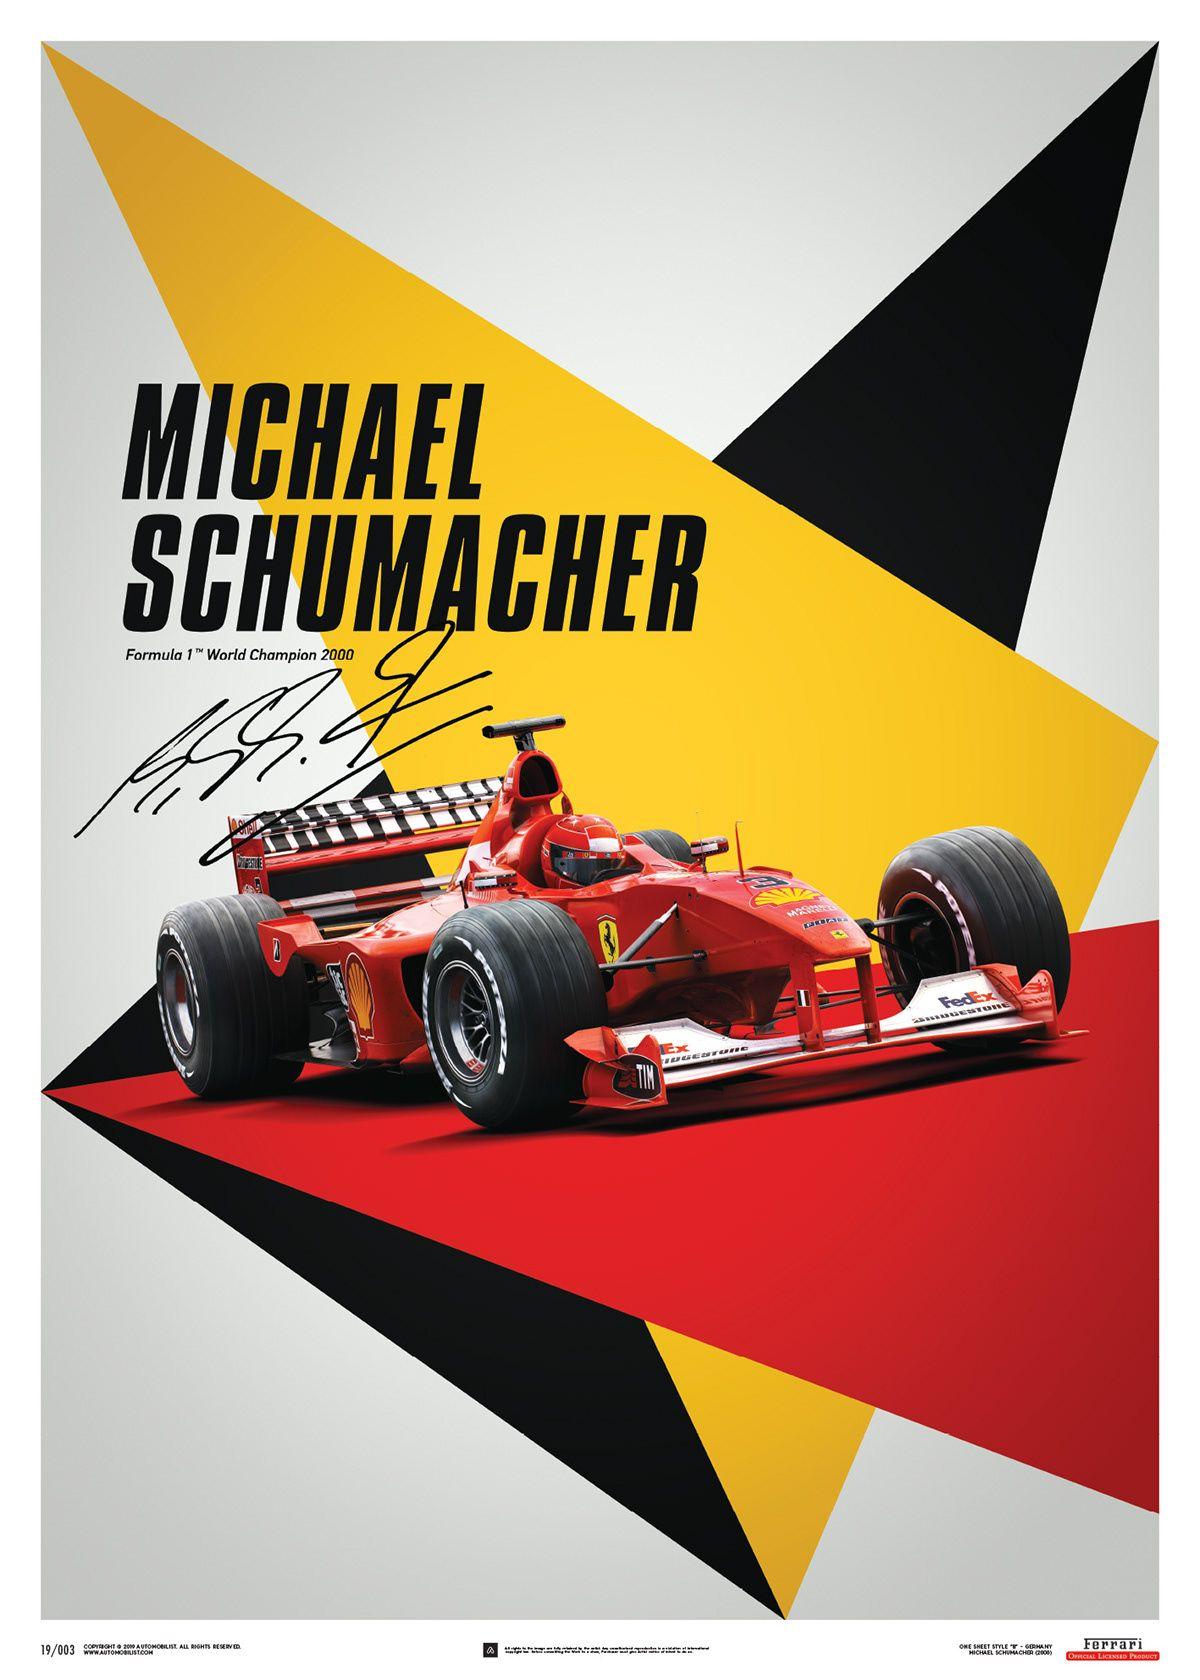 Michael Schumacher in 2020 Michael schumacher, Ferrari